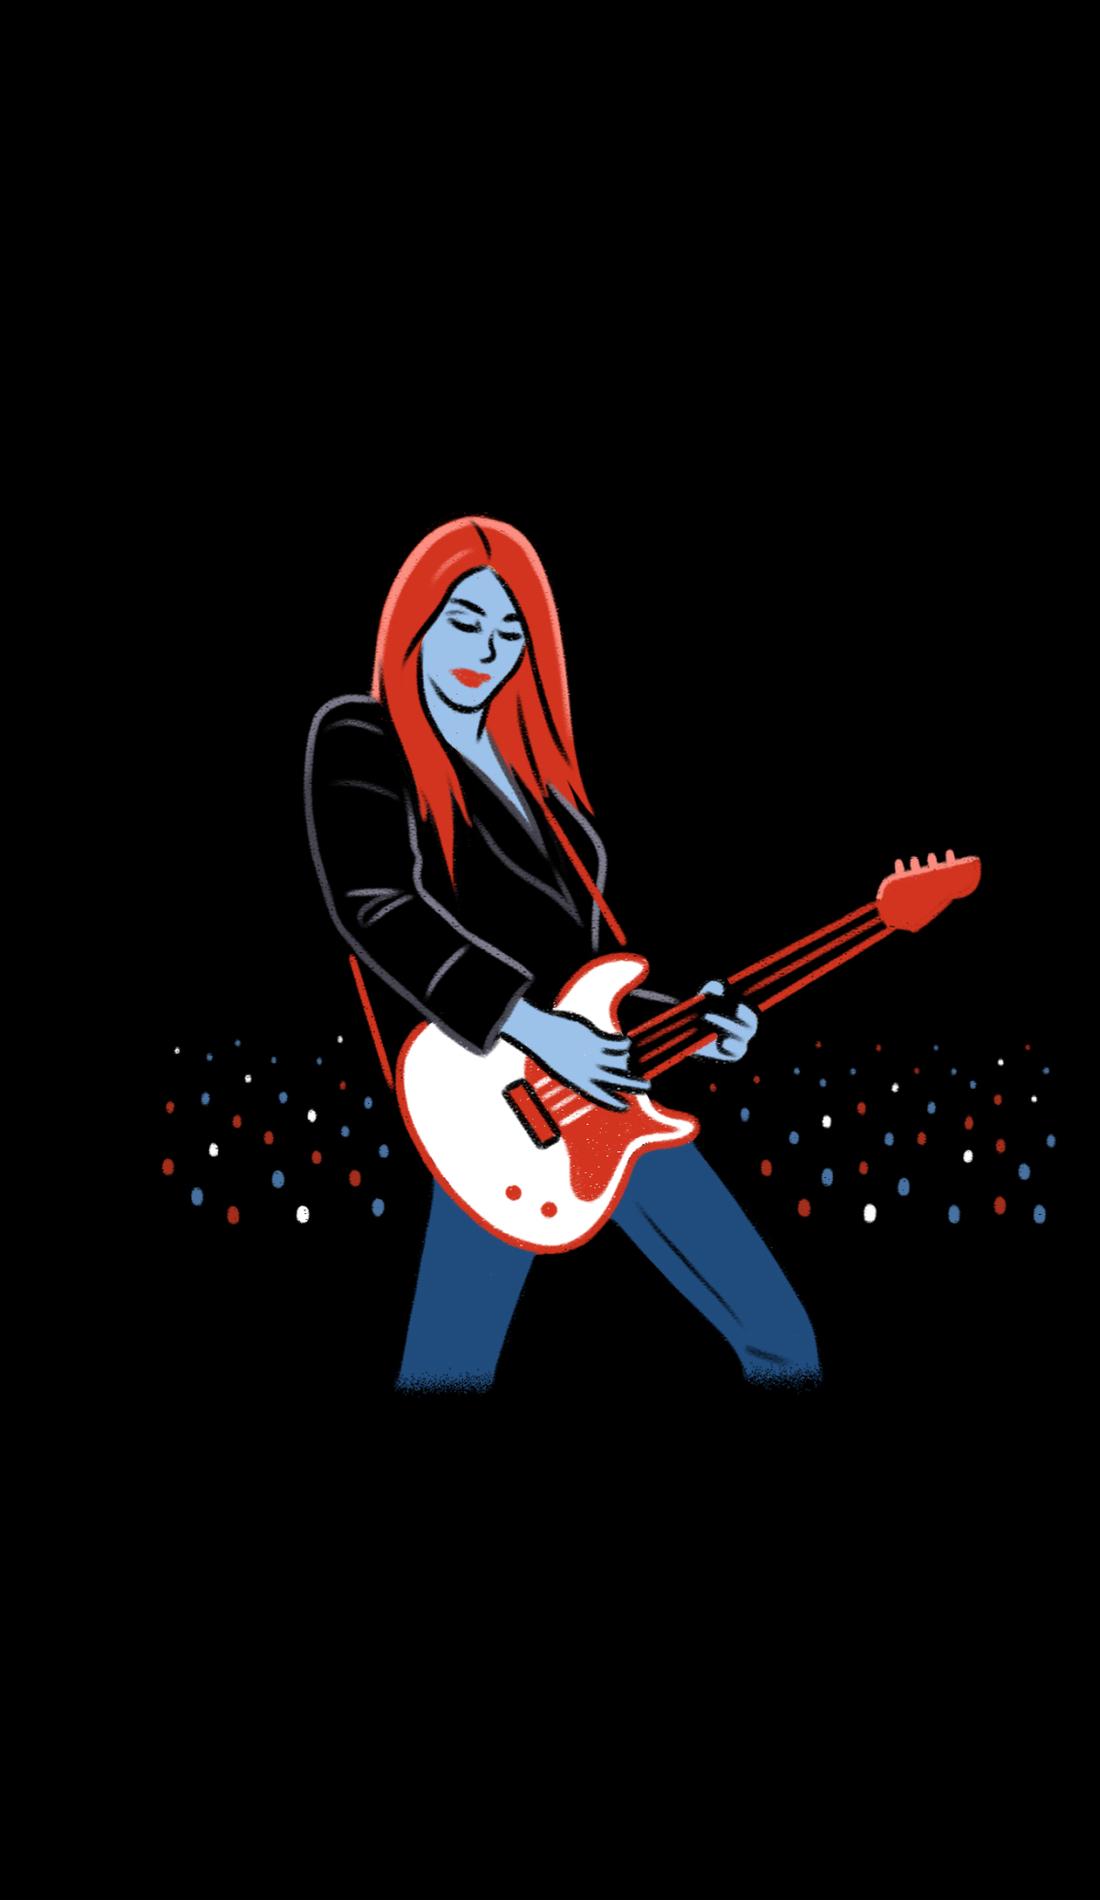 A Silent Disco live event